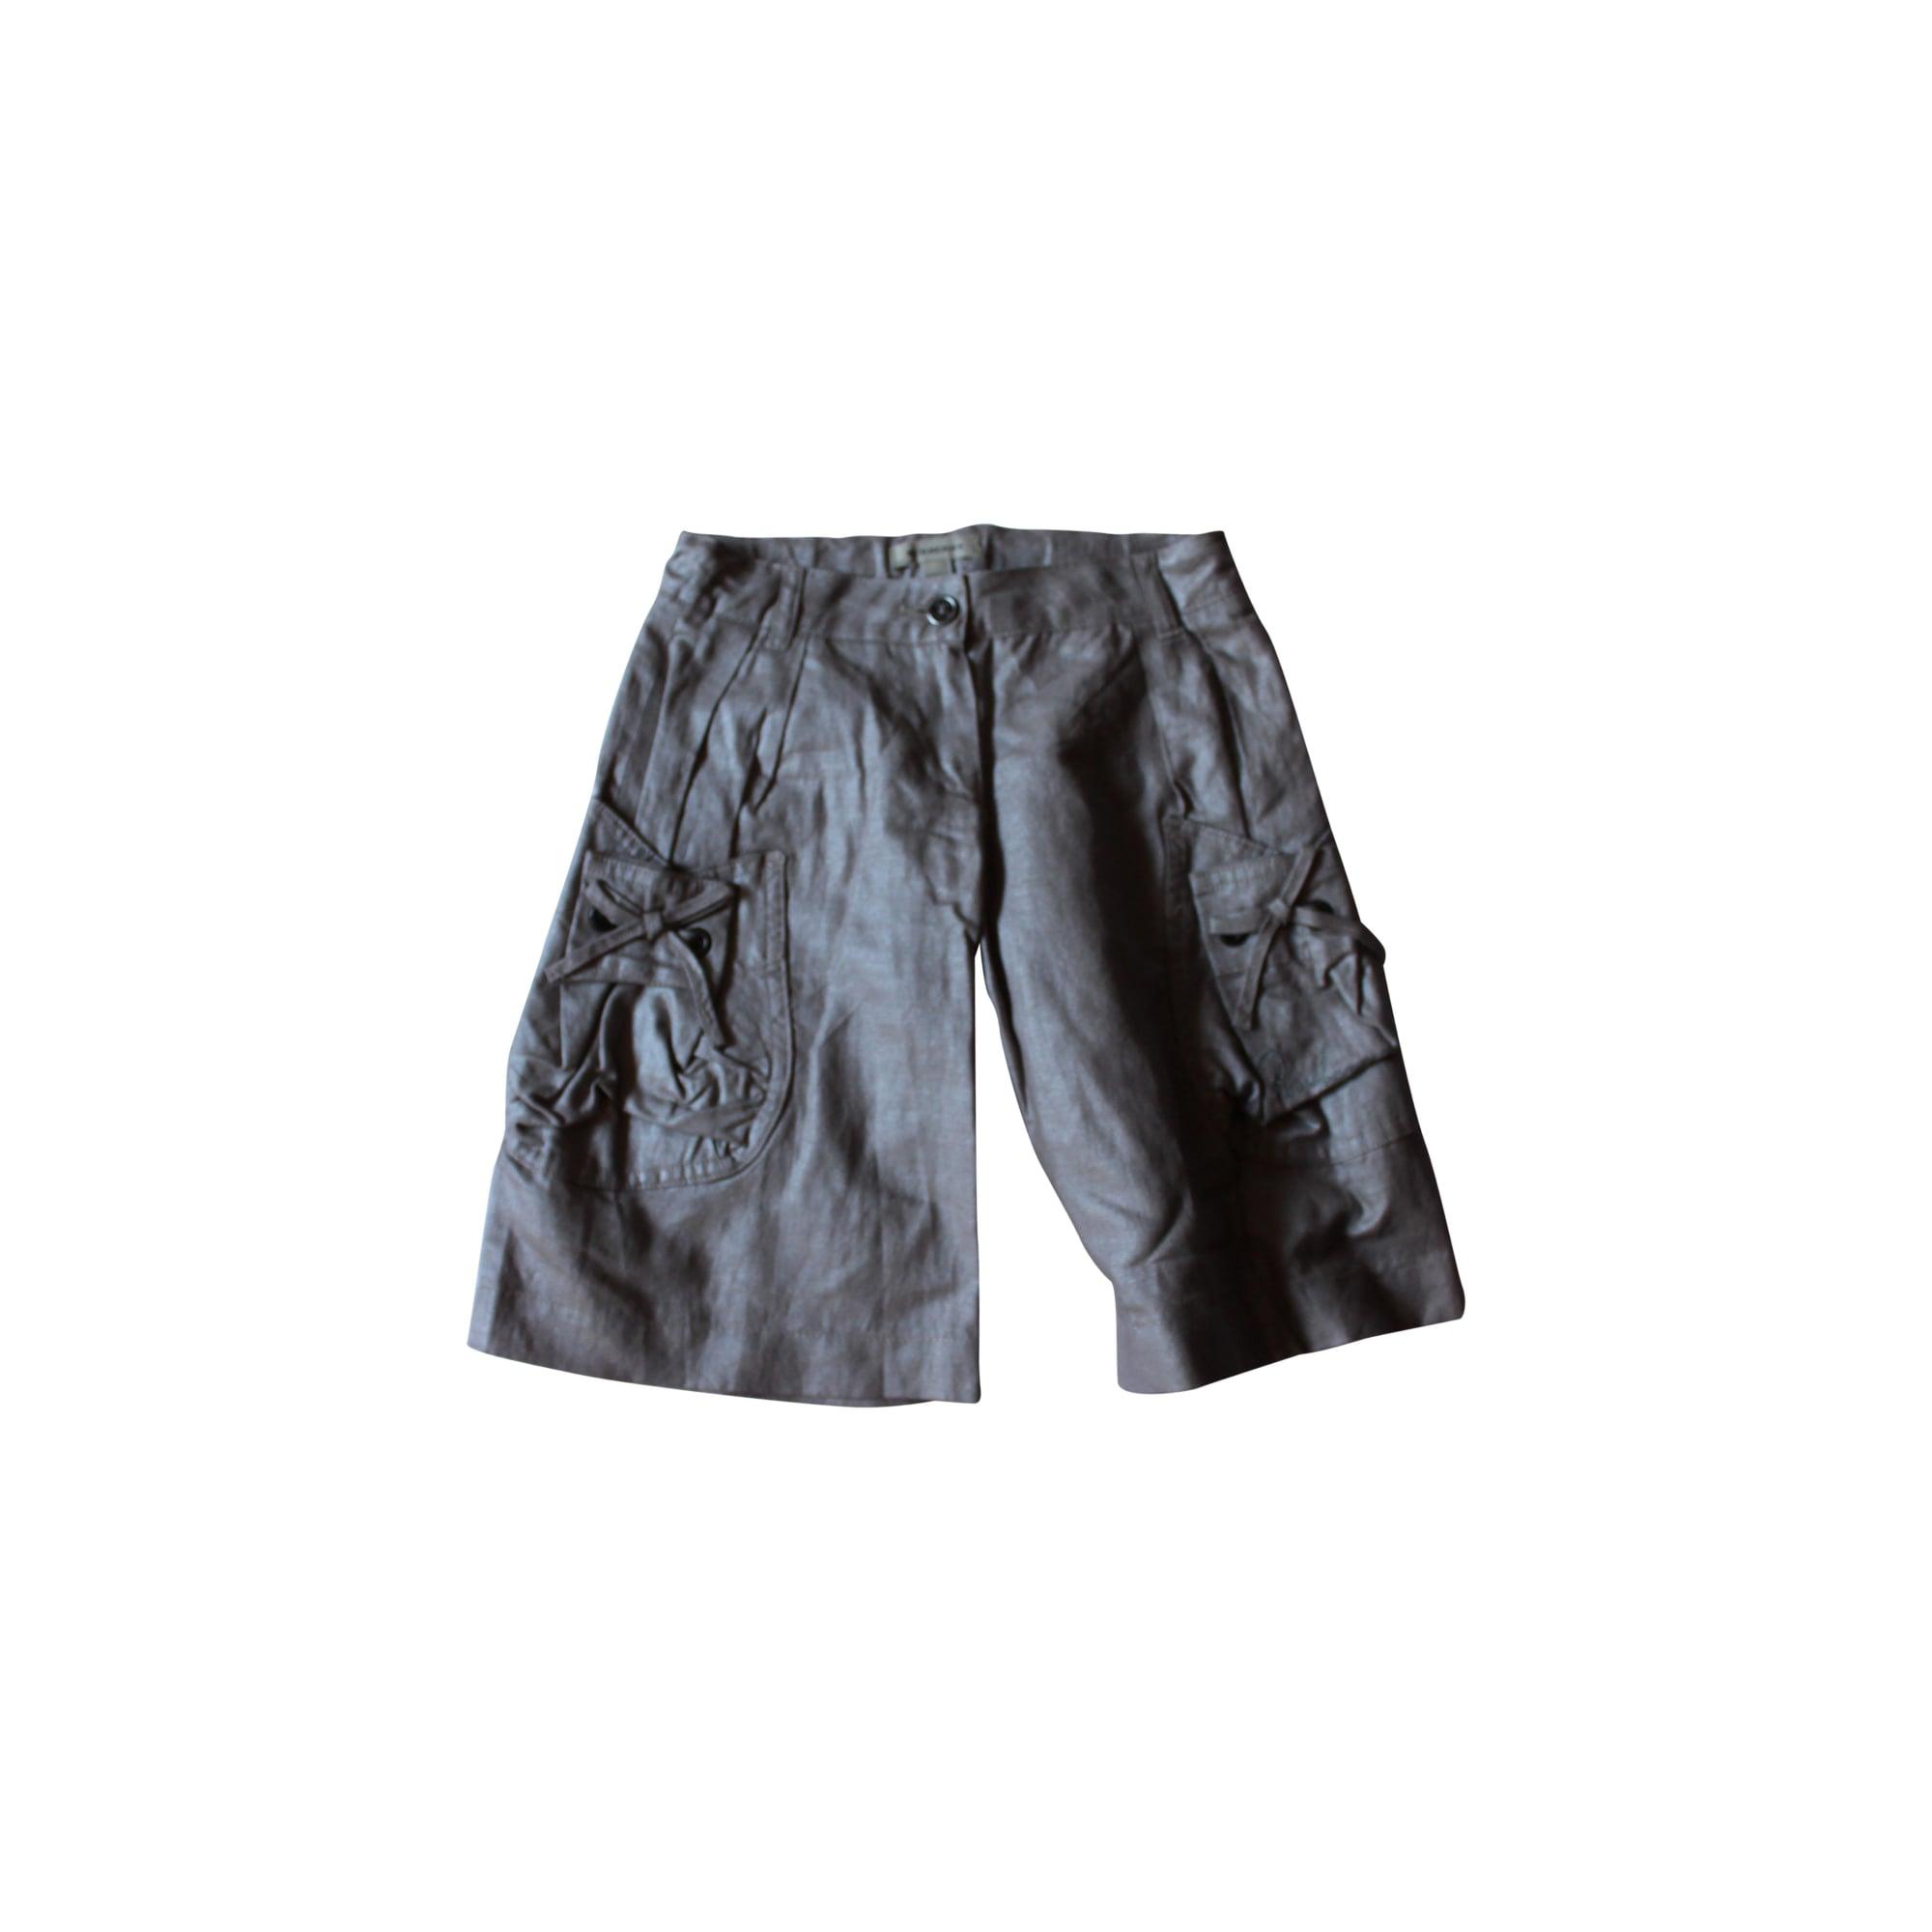 Bermuda Shorts BURBERRY Silver